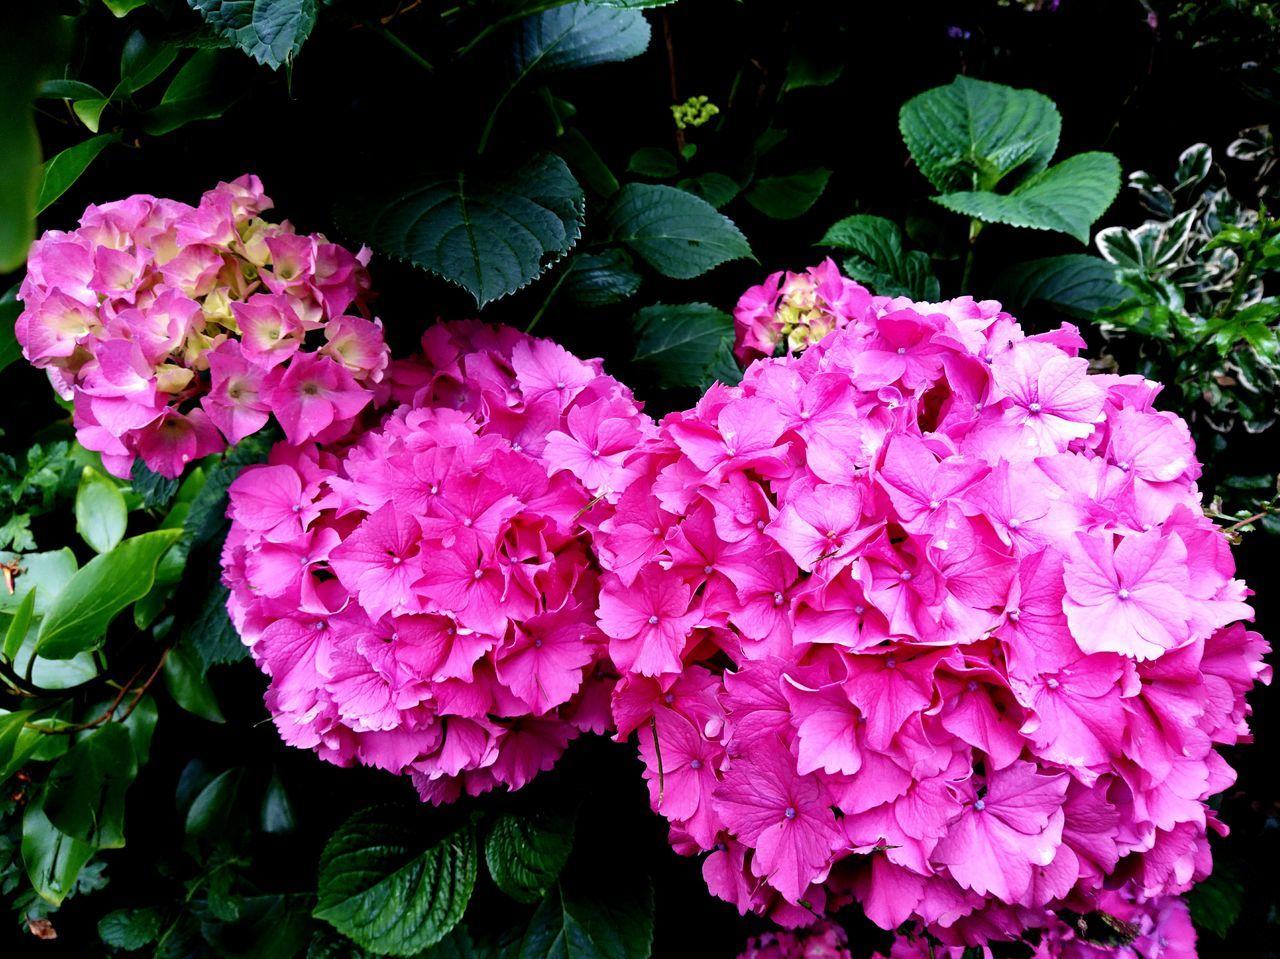 Hydrangea Pink Pink Flowers Garden Photography Garden Colorful